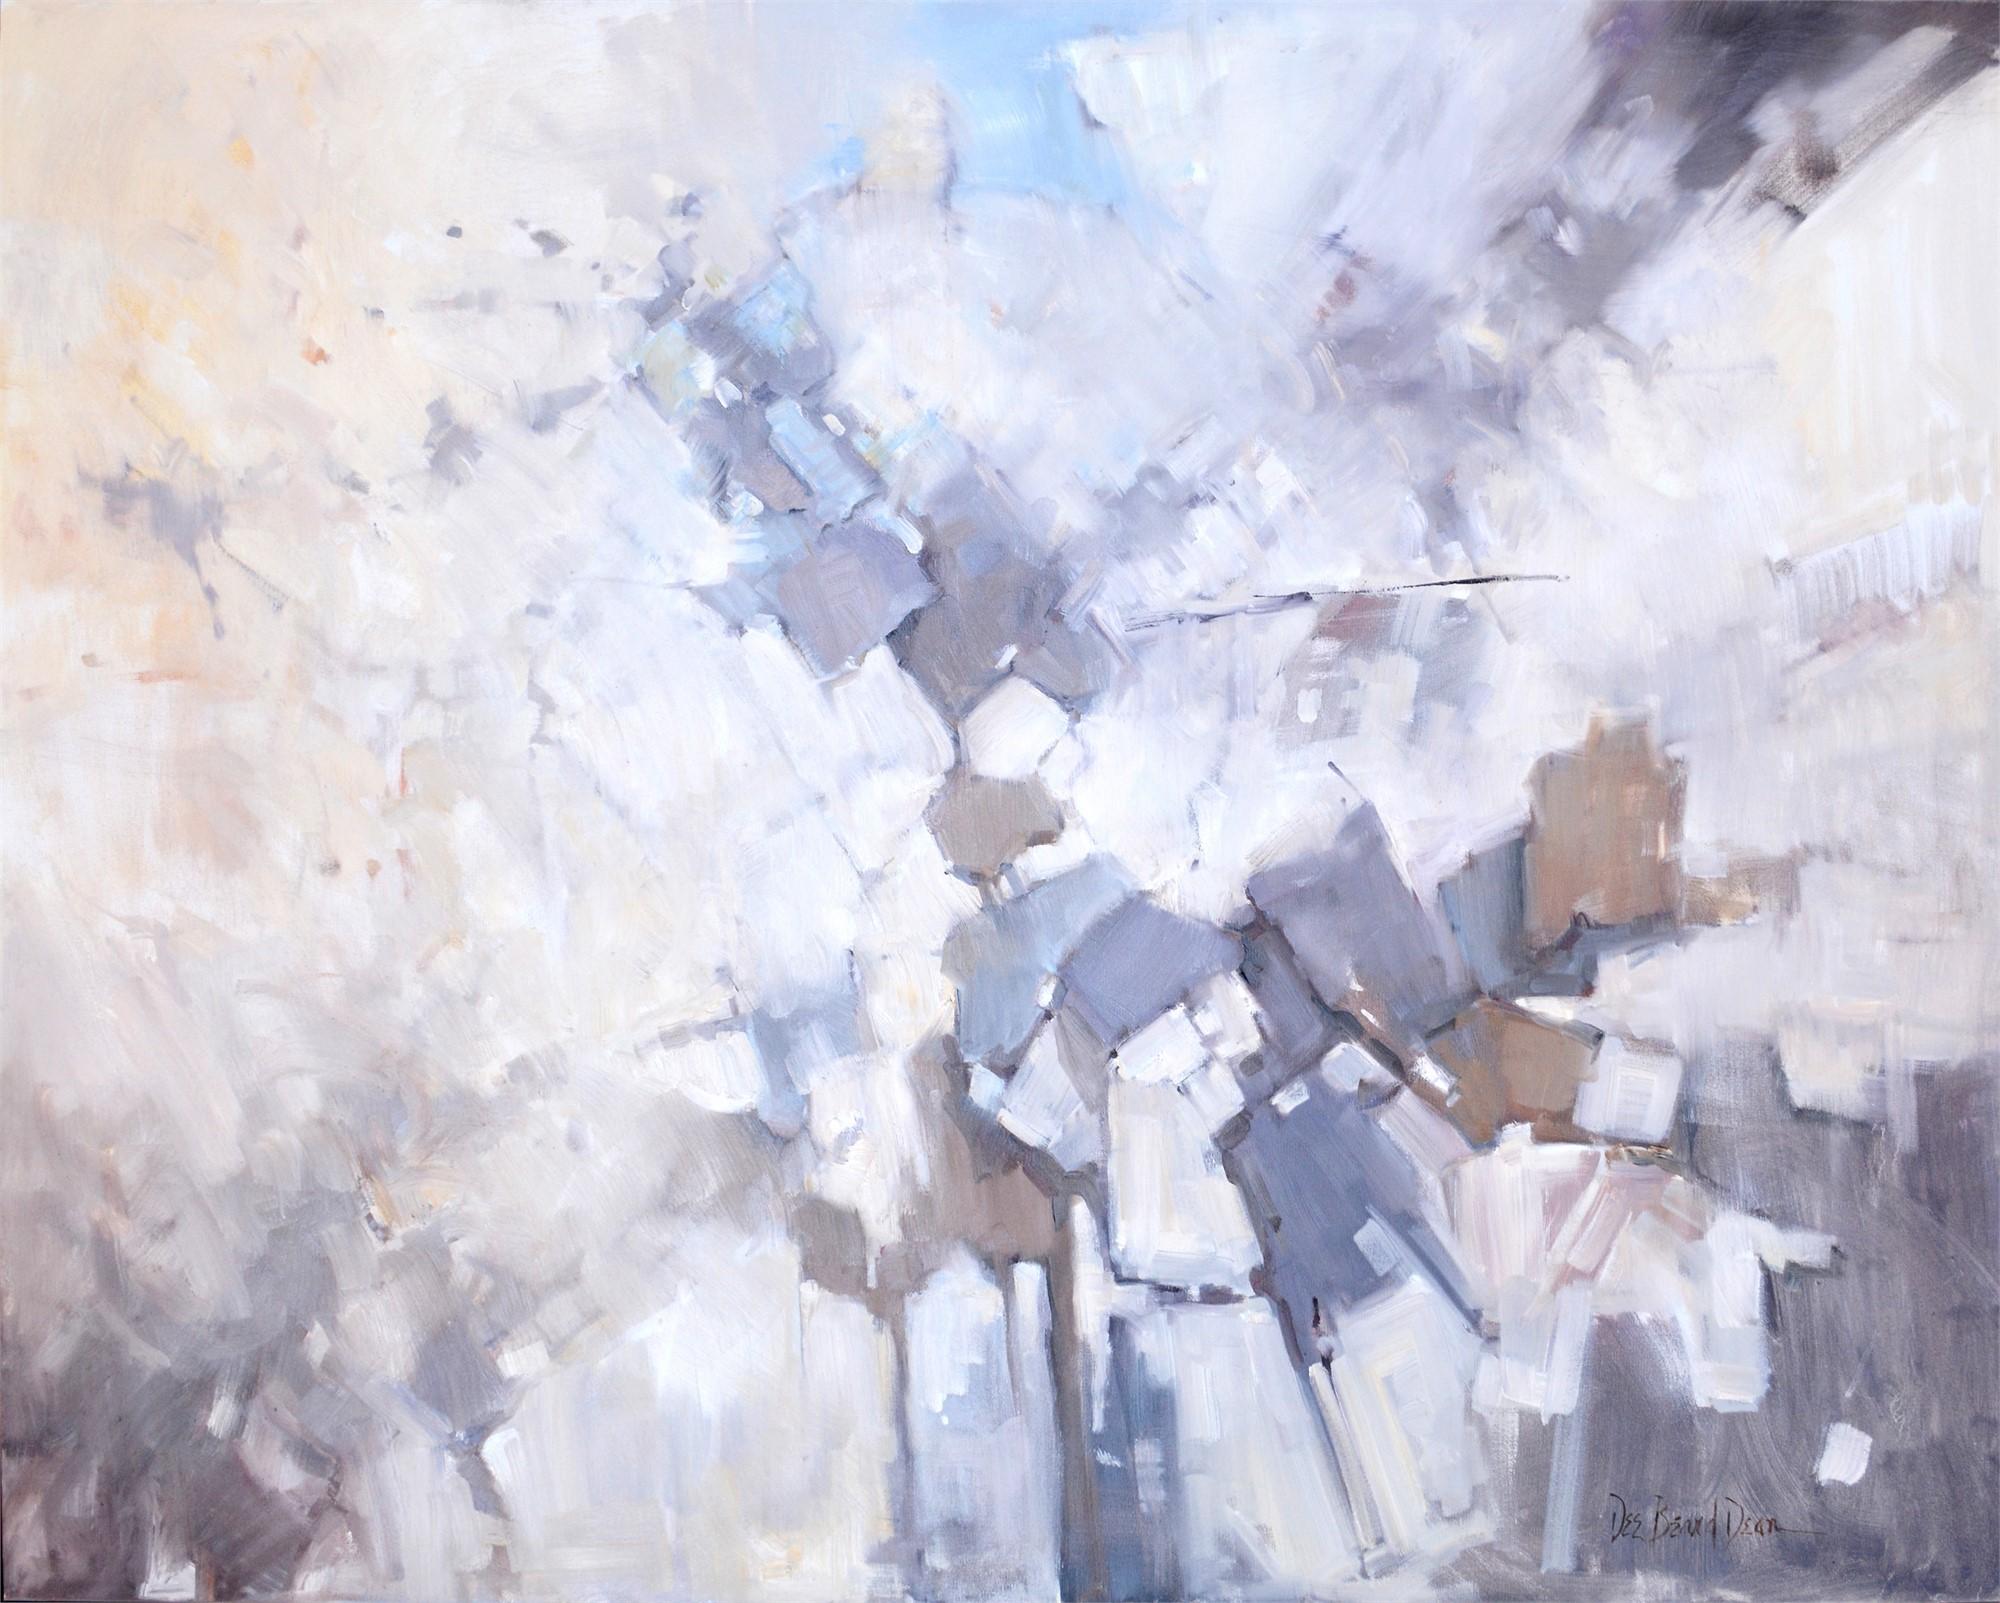 Shades of Gray by Dee Beard Dean